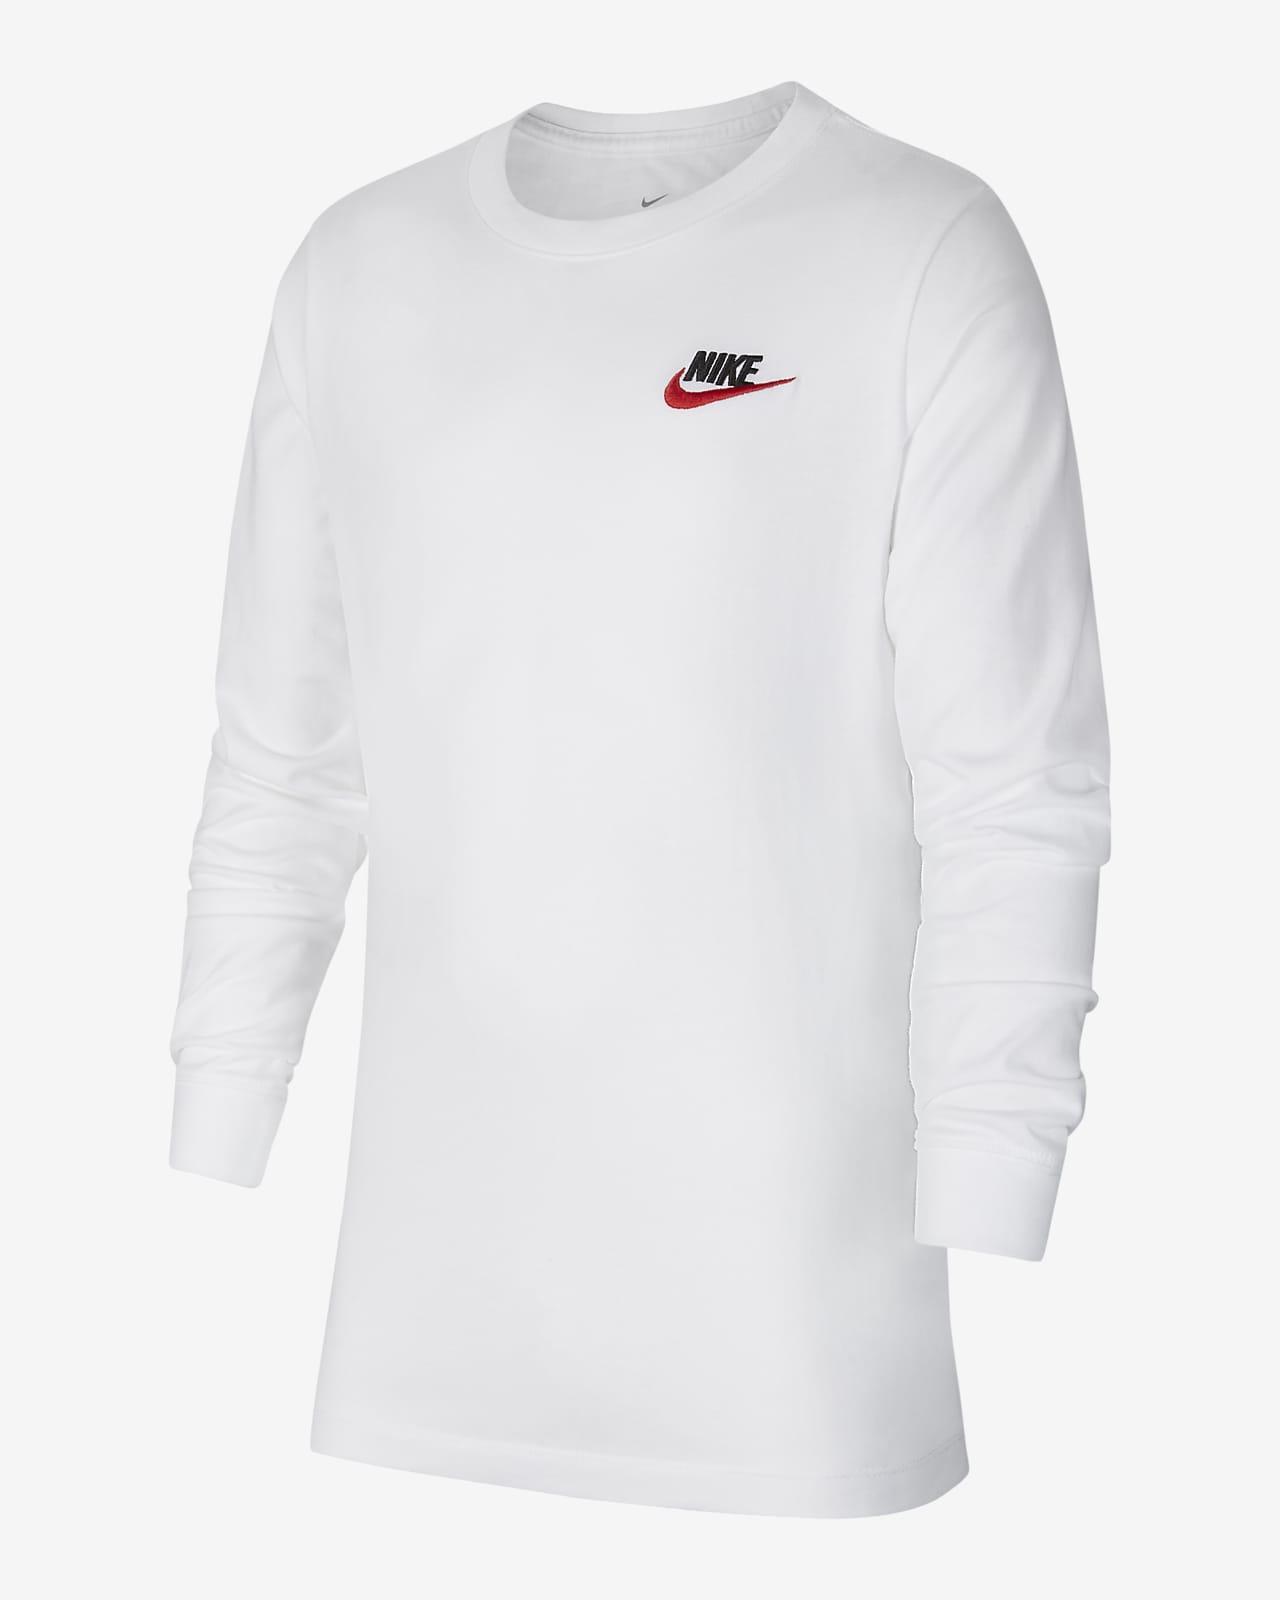 Nike Sportswear 大童(男孩)长袖T恤